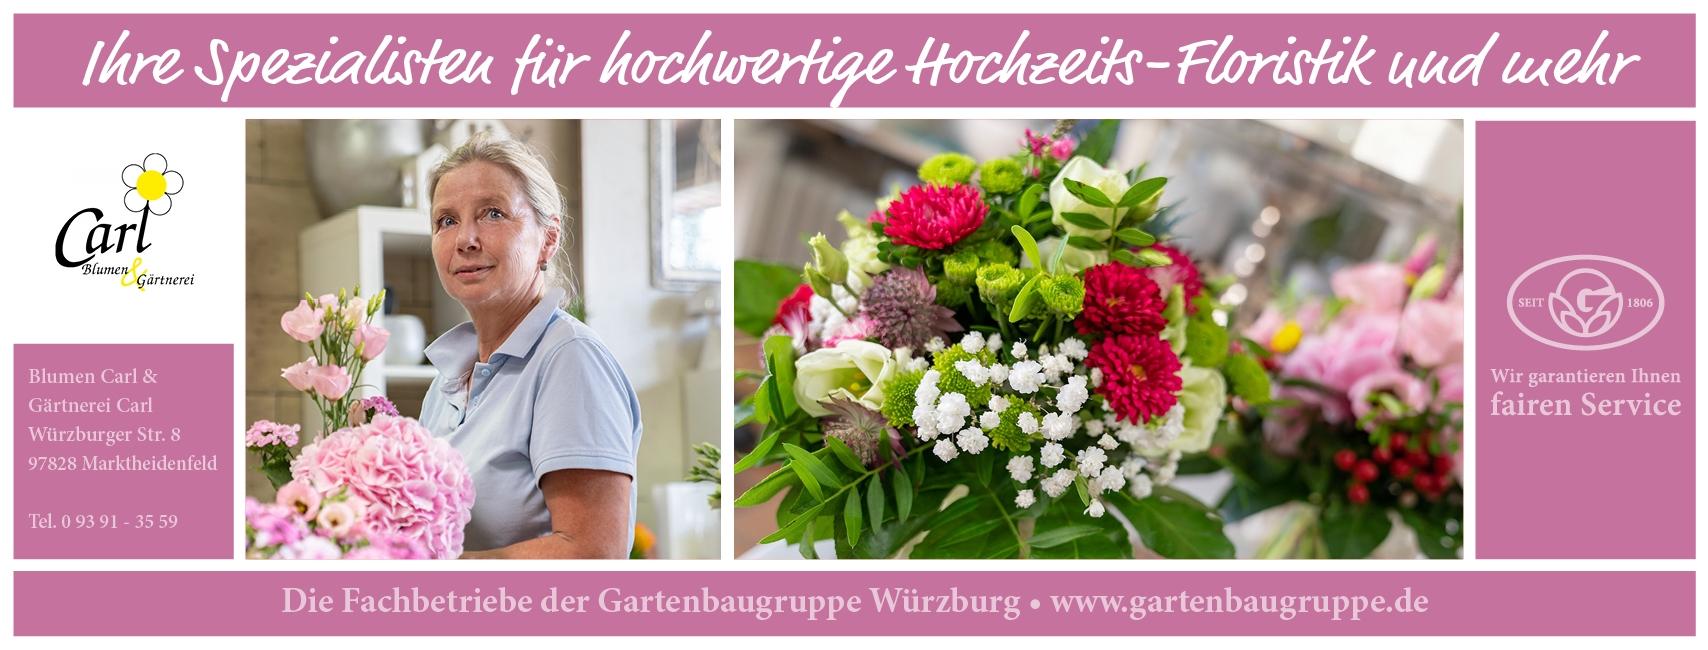 Blumen & Gärtnerei Carl - Gartenbaugruppe Würzburg